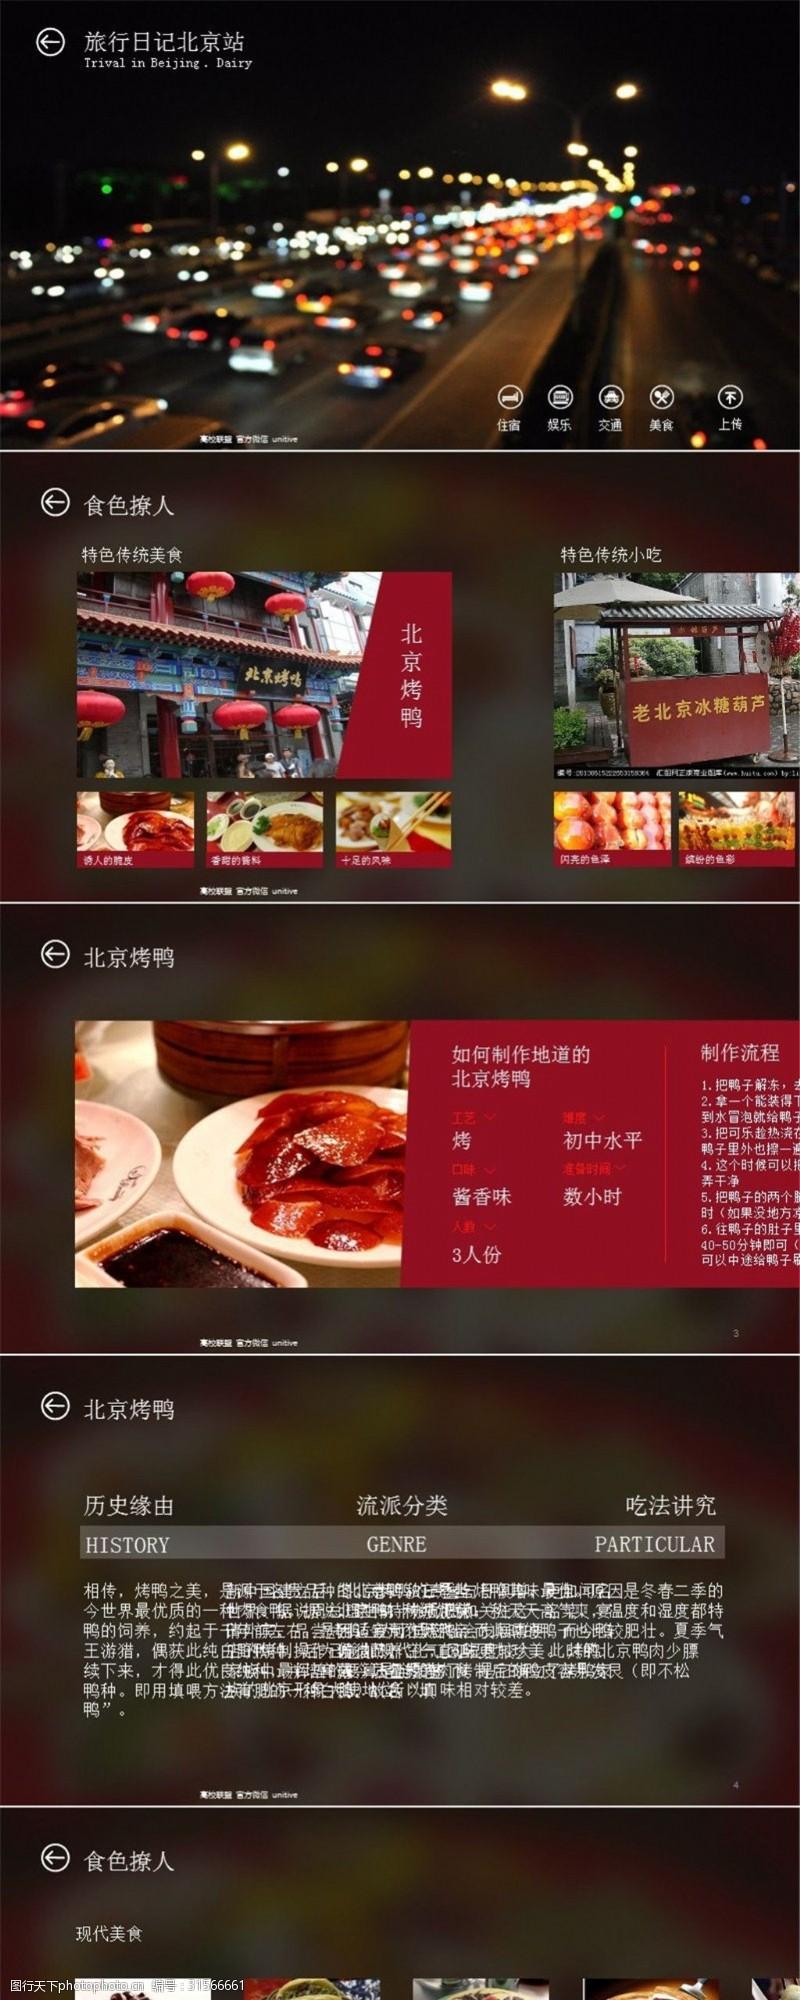 ppt总结模板北京旅游日记ios风格ppt模板